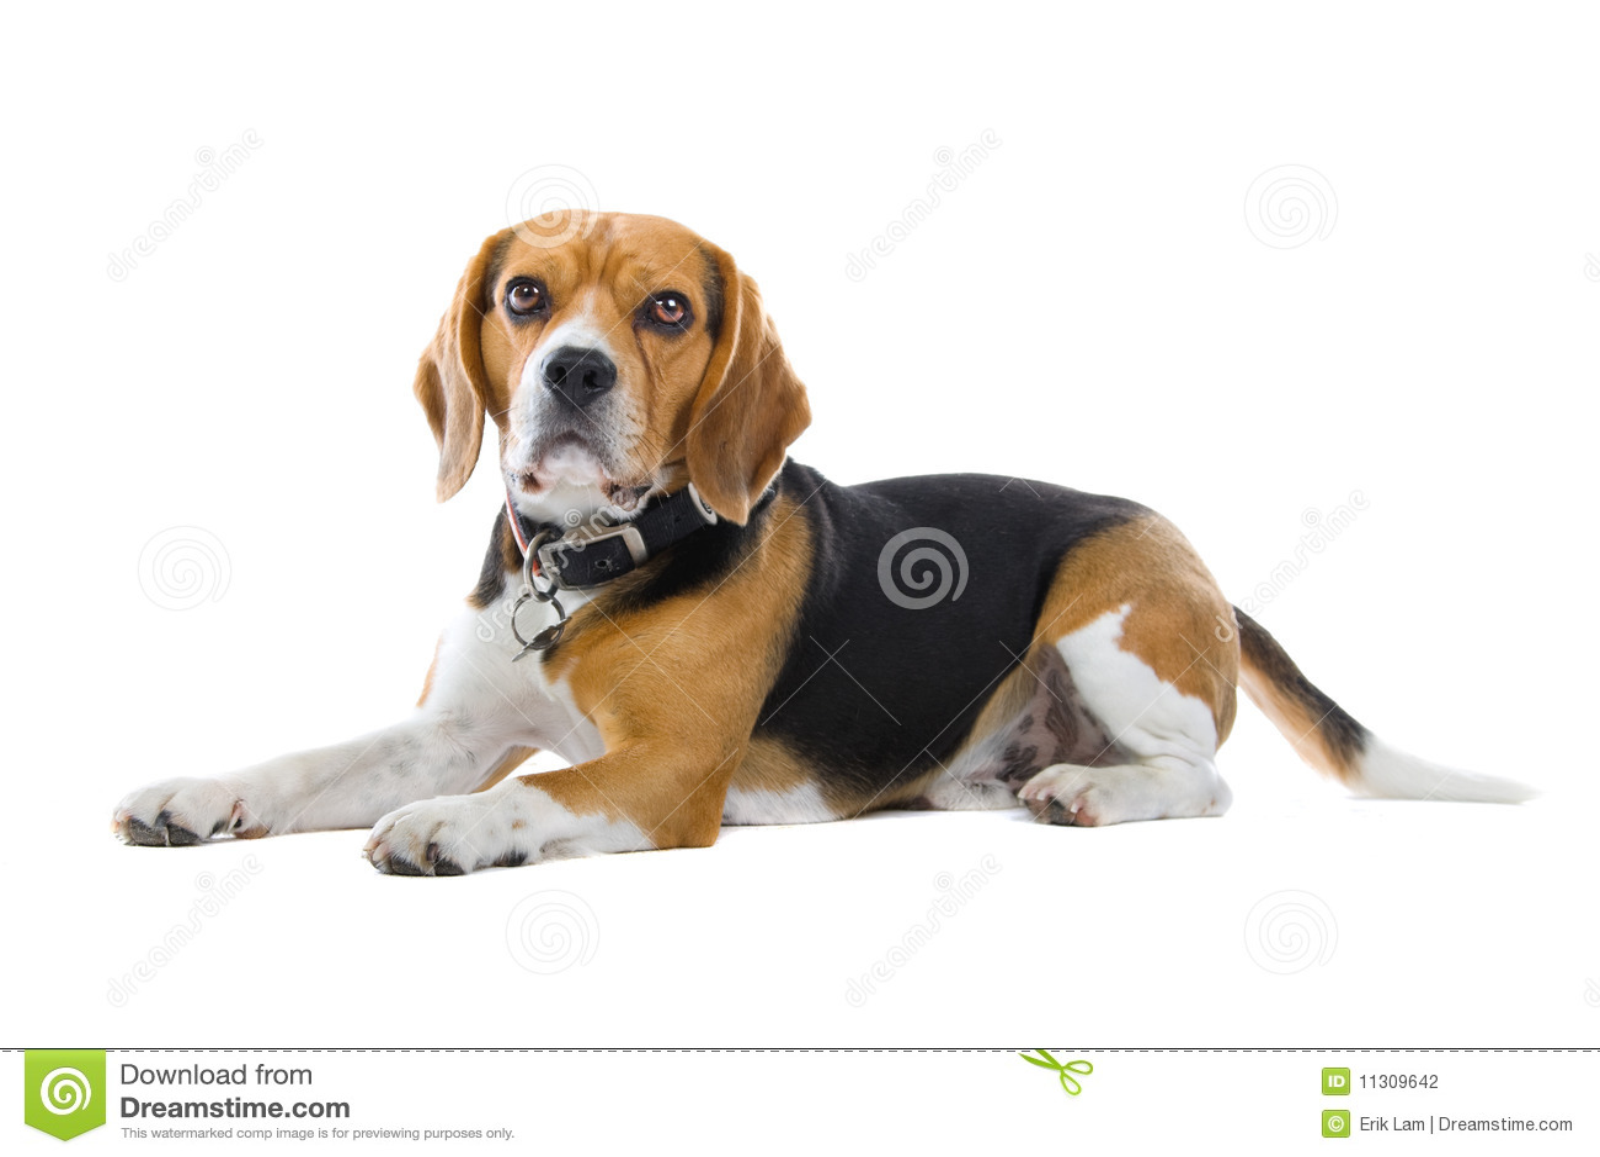 Dachshundjagdhund